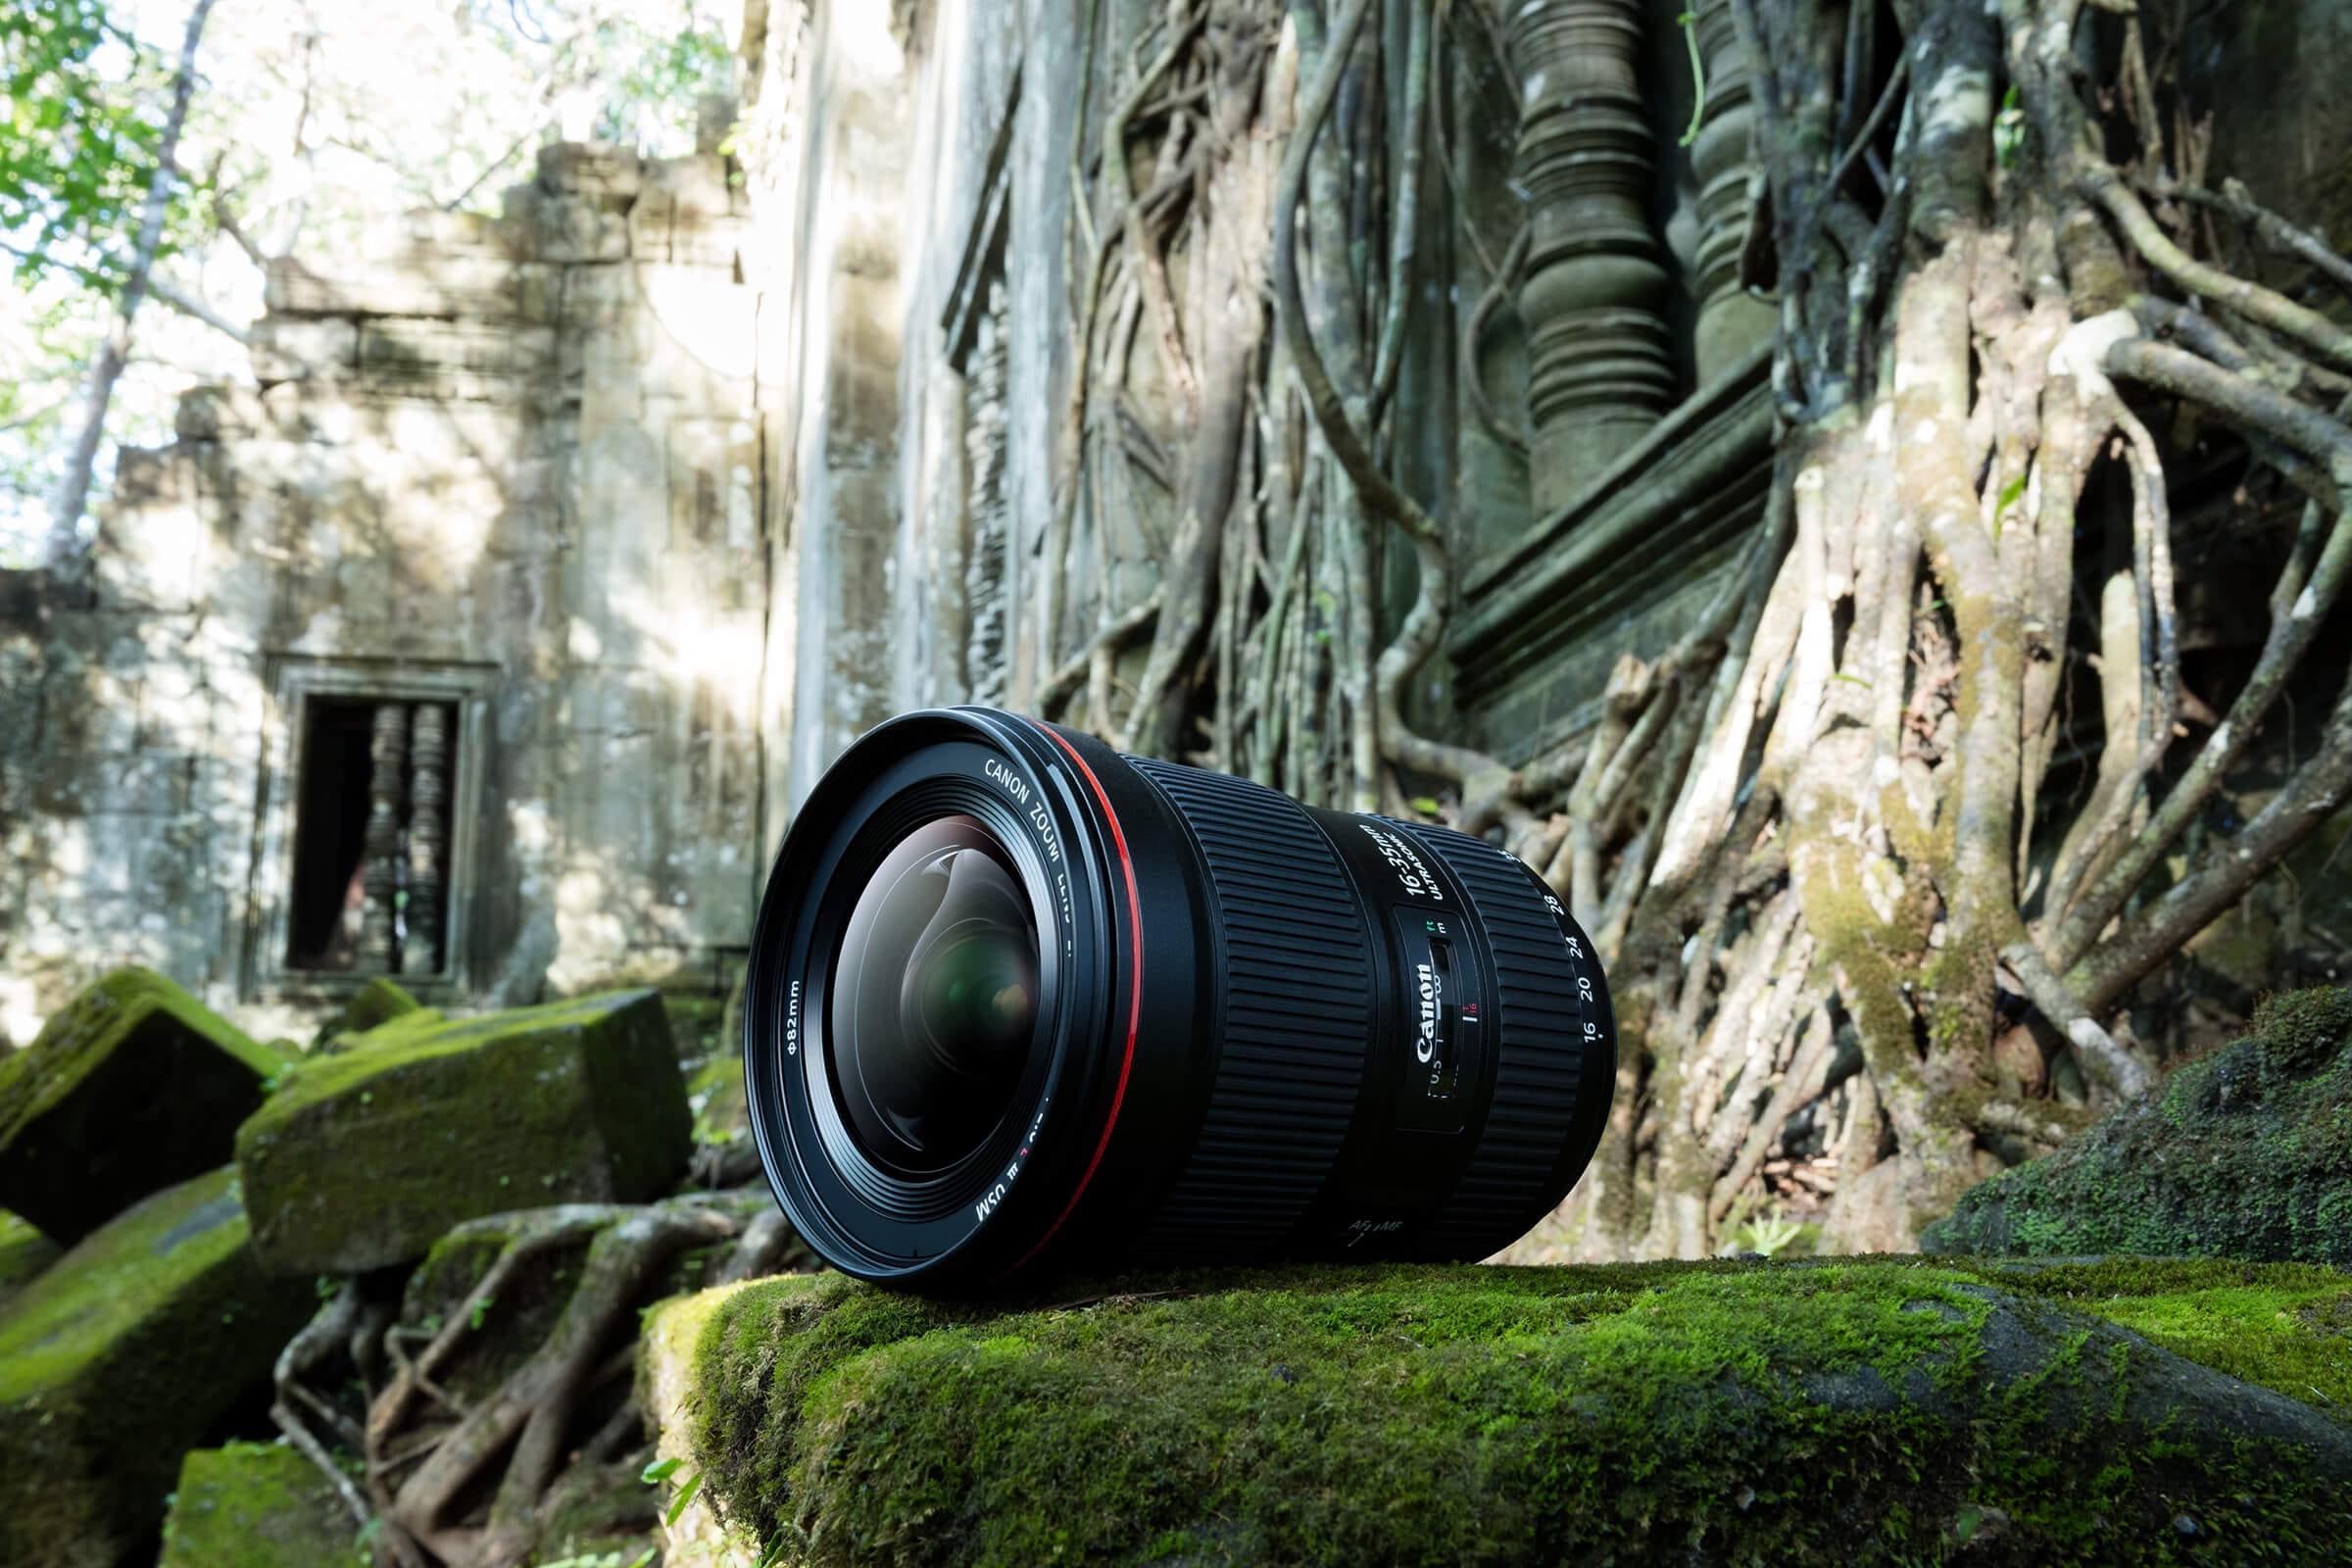 Interchangeable Lens Camera